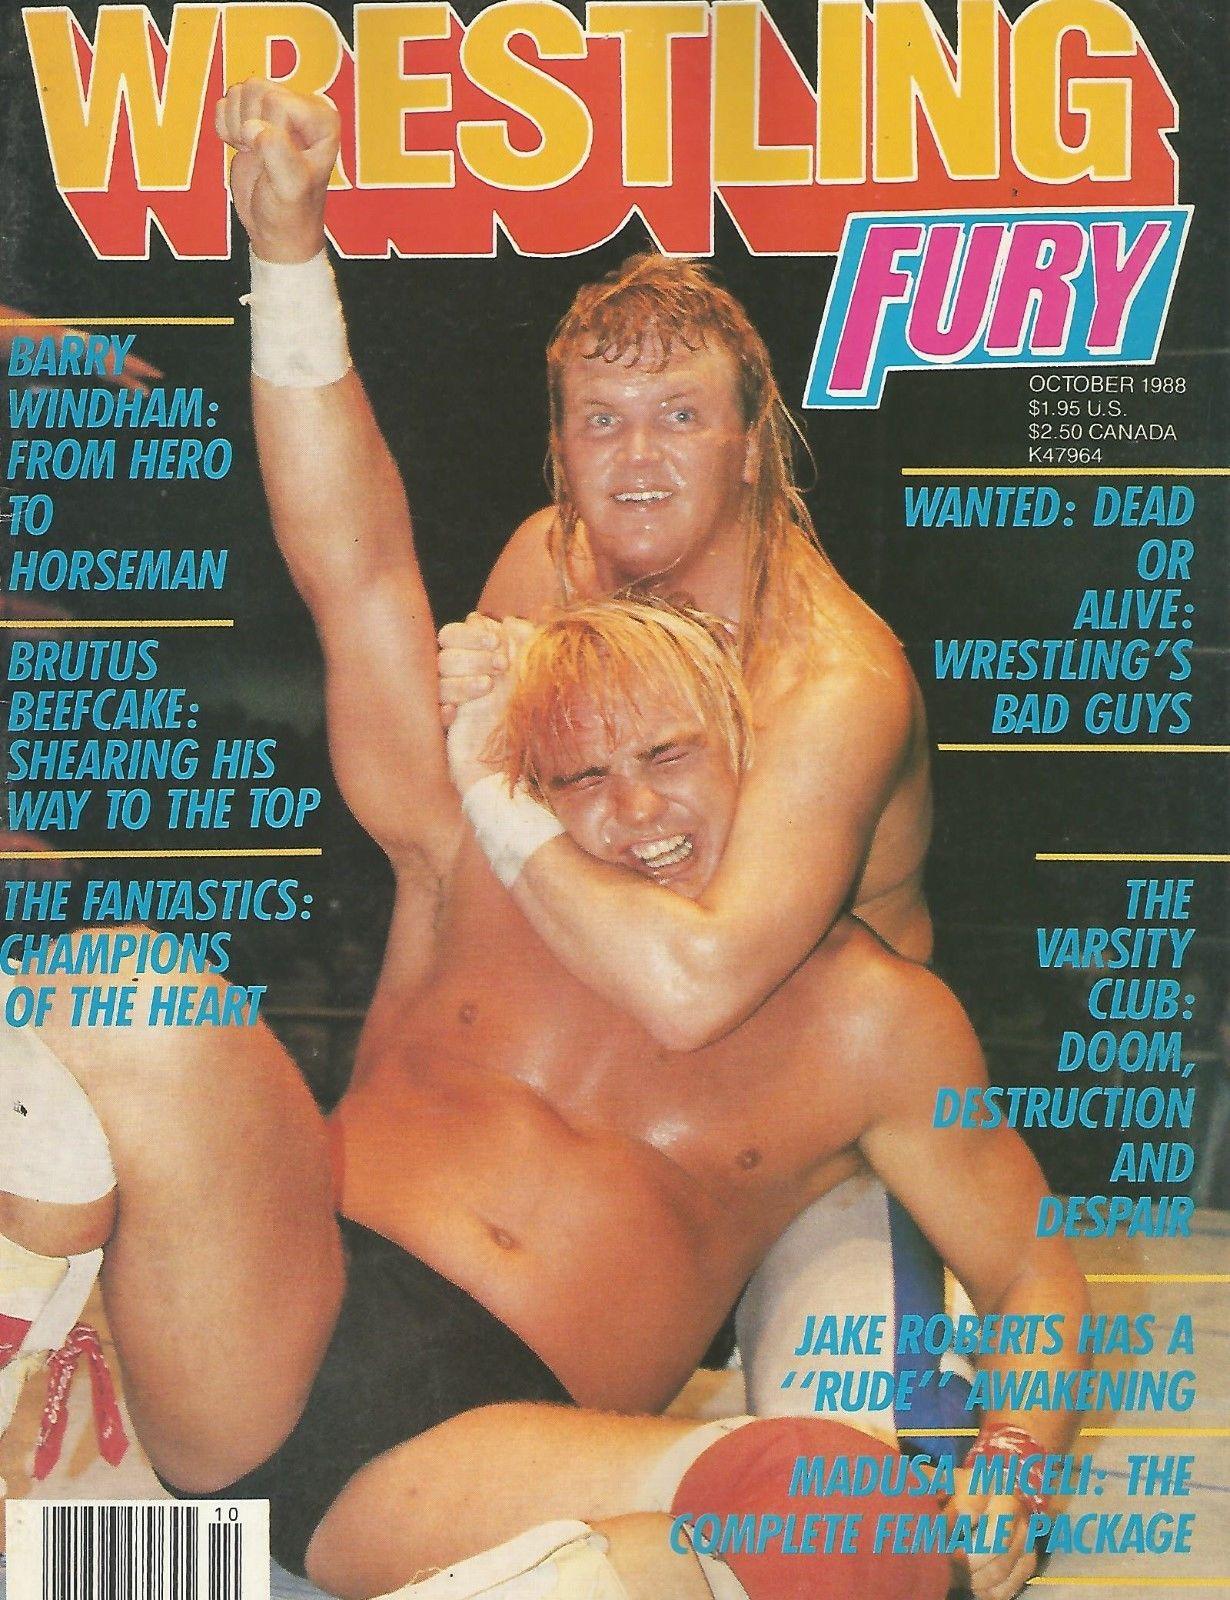 Wrestling Fury - October 1988